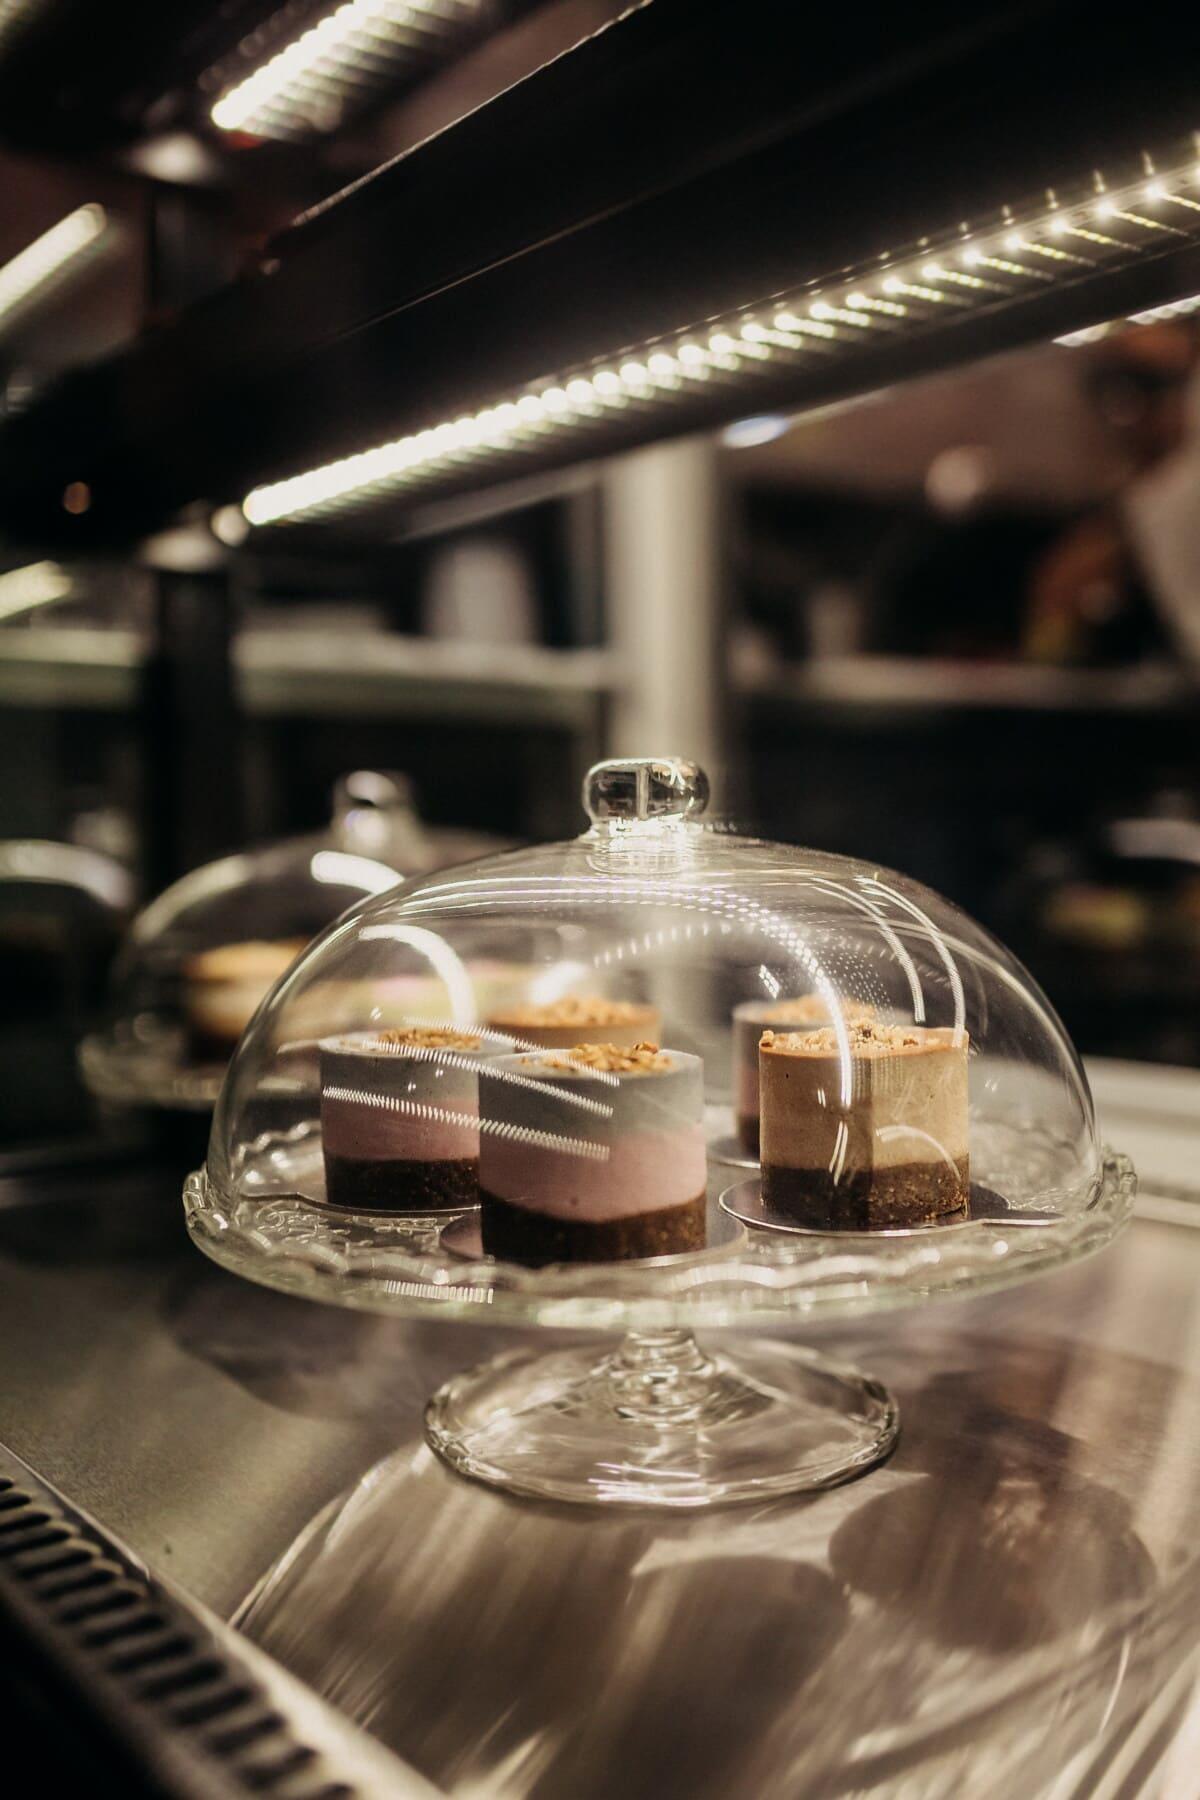 shelf, cake shop, glass, indoors, food, restaurant, still life, blur, light, chocolate